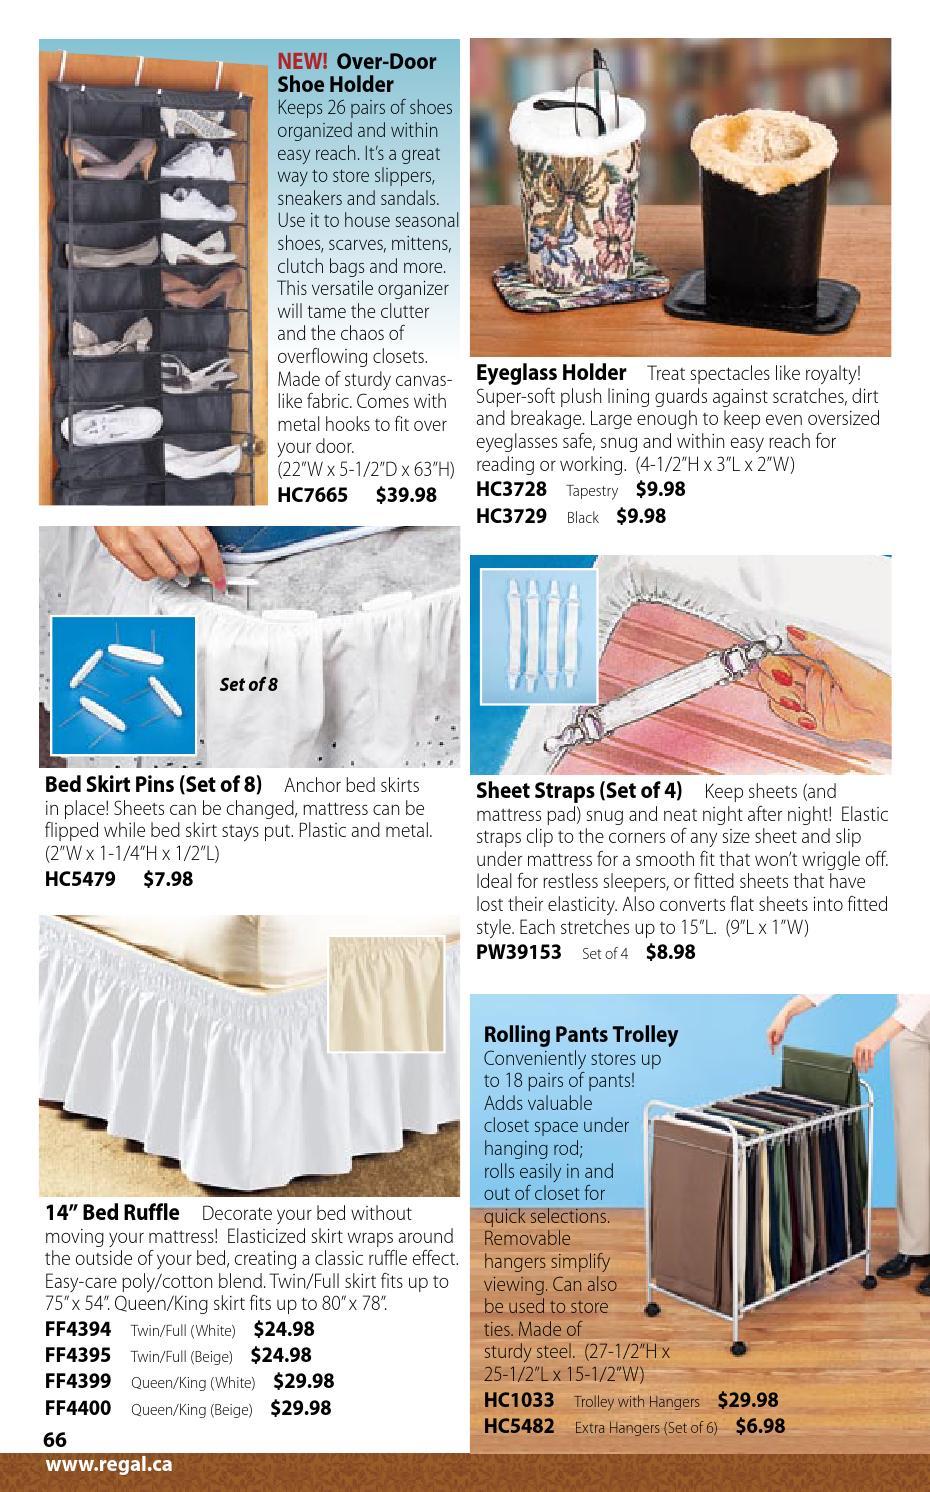 Home & Garden Bed Skirts Bed Skirt Pins Set of 8 / Keep bedskirts